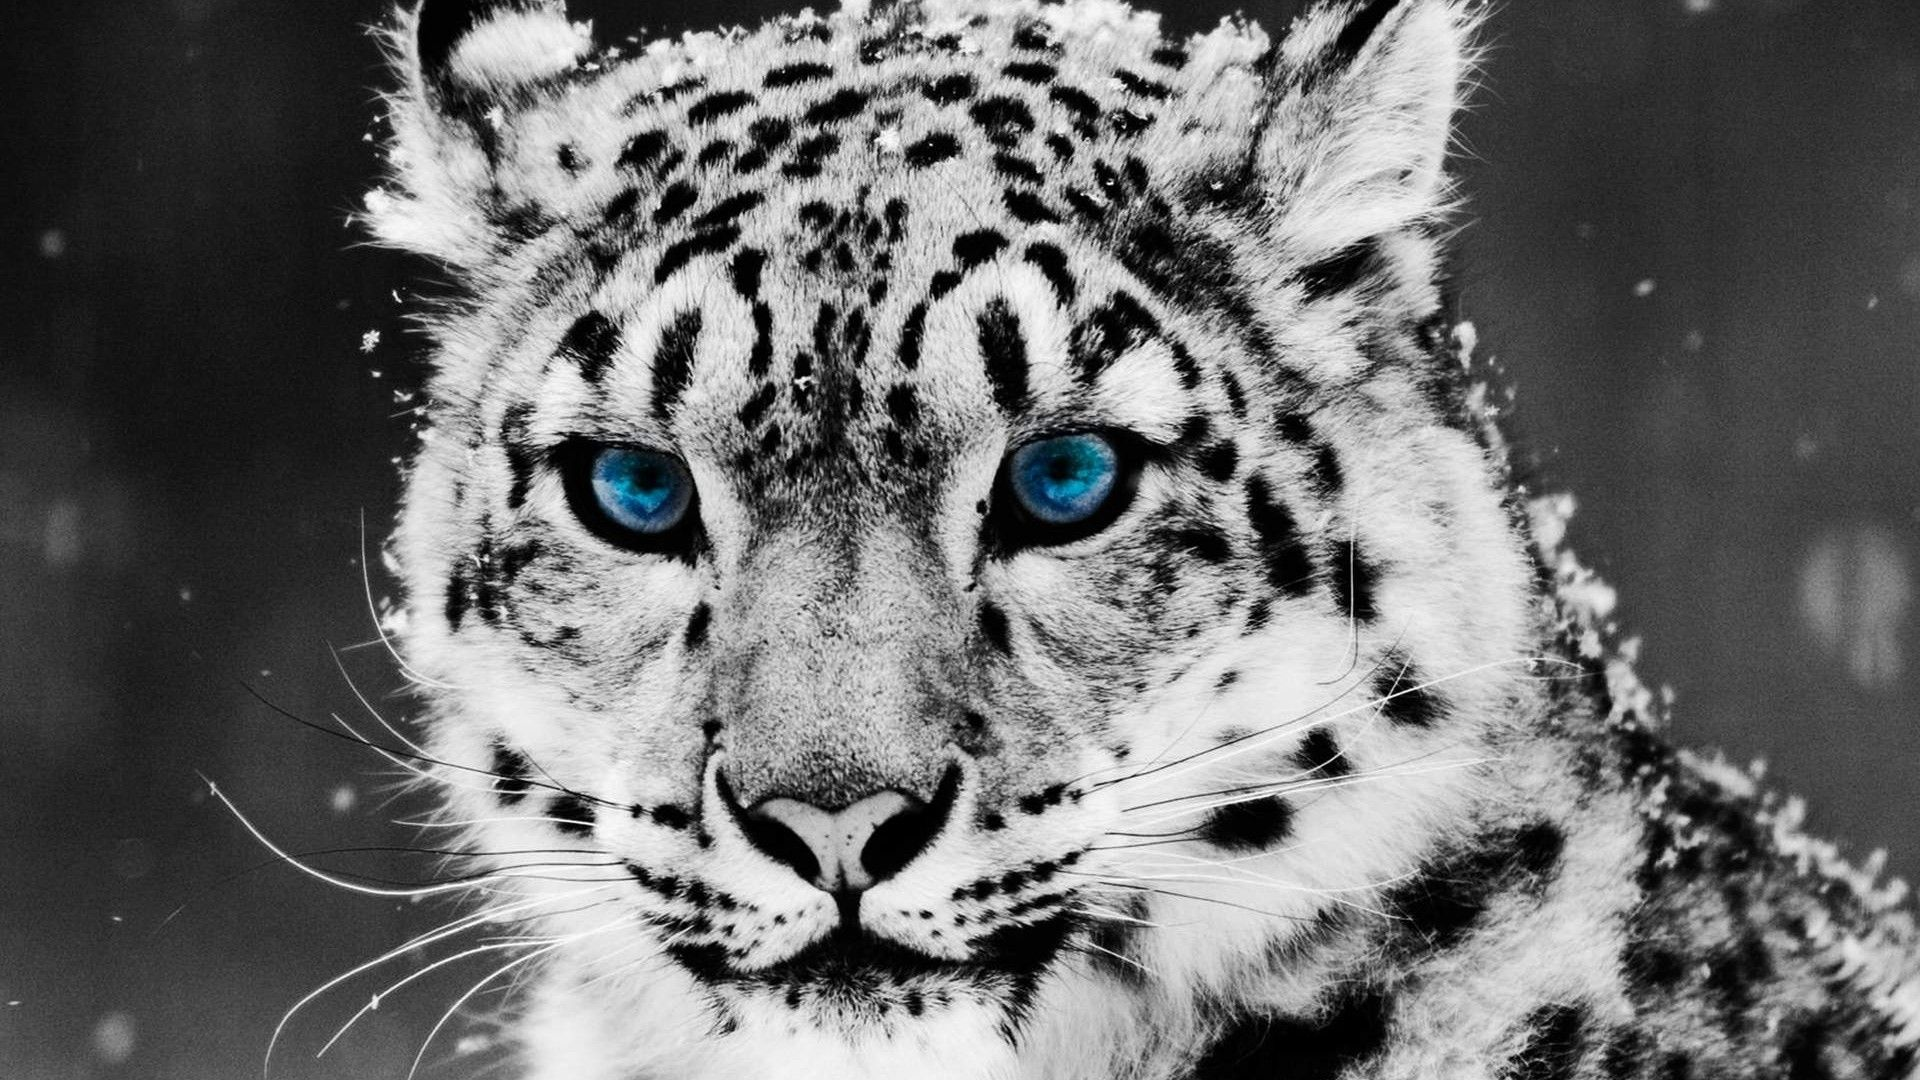 Snow Leopard Wallpaper Leopard pictures, Animals